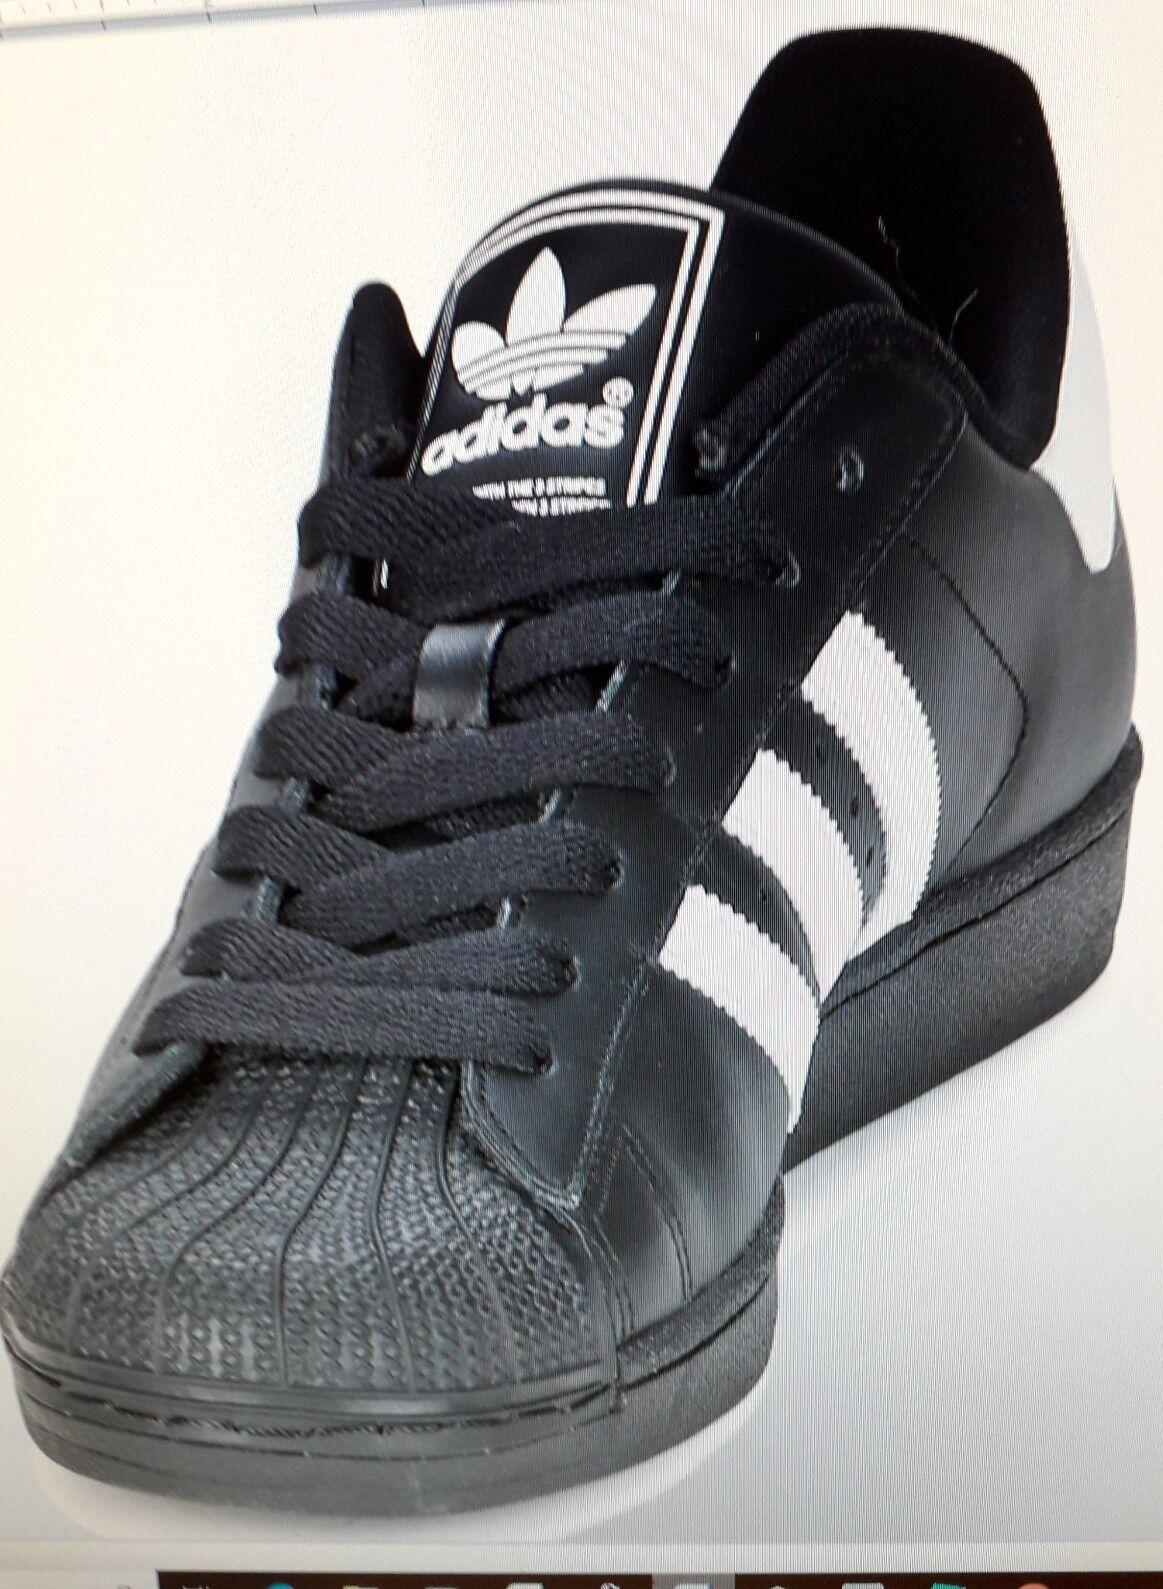 Adidas Super S Trainers BLK WHT size 11